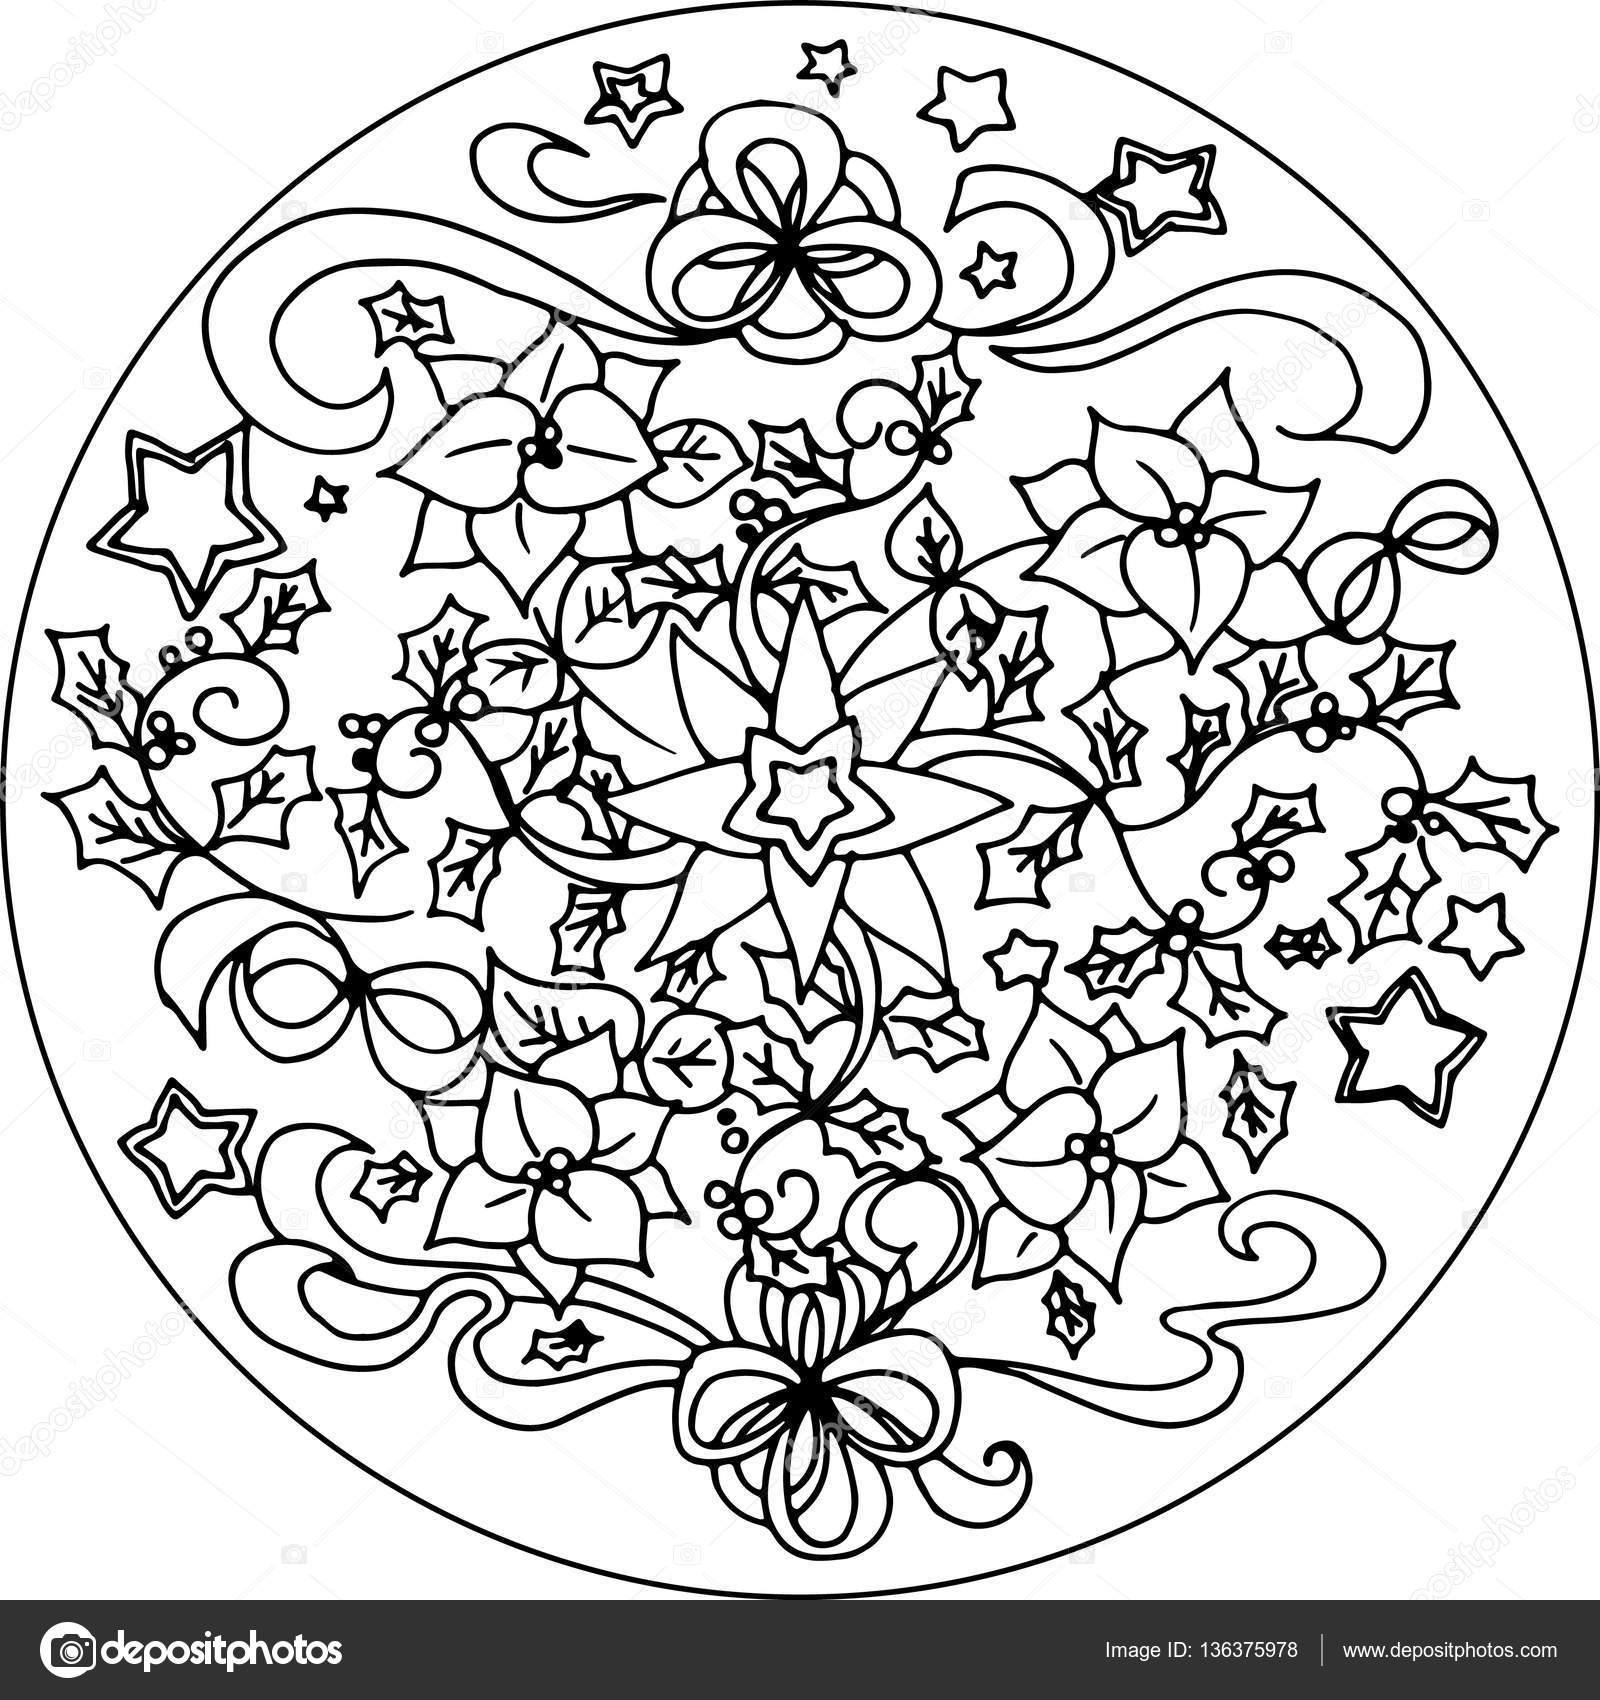 Weihnachten Malvorlagen Mandala Vektor — Stockvektor © carlacastagno ...